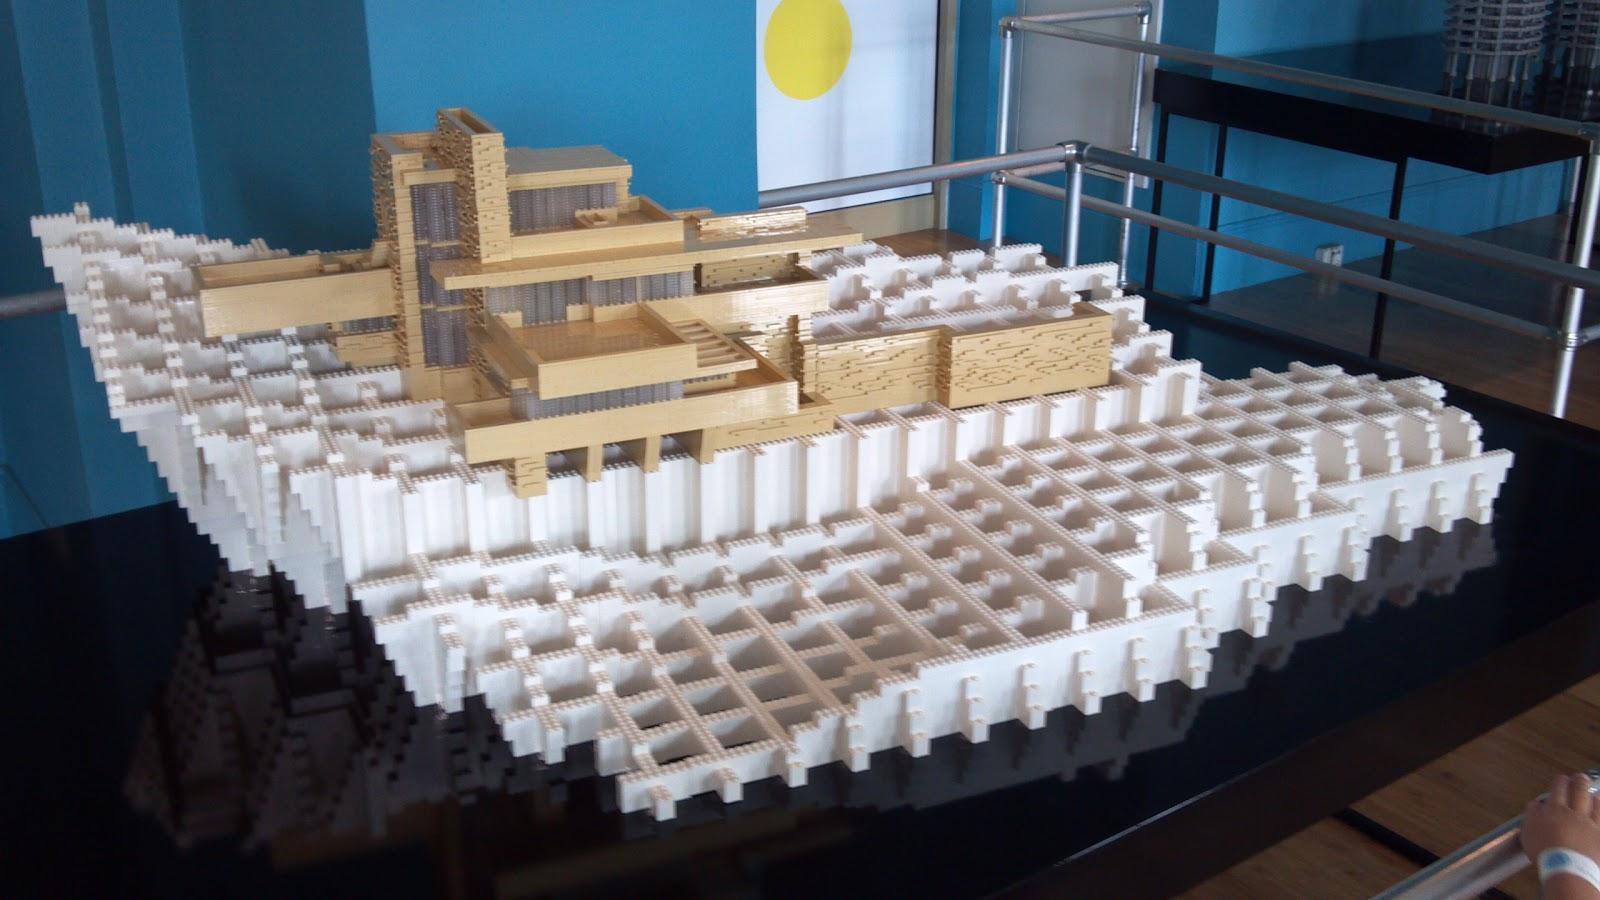 Large falling water lego model - Falling waters lego ...